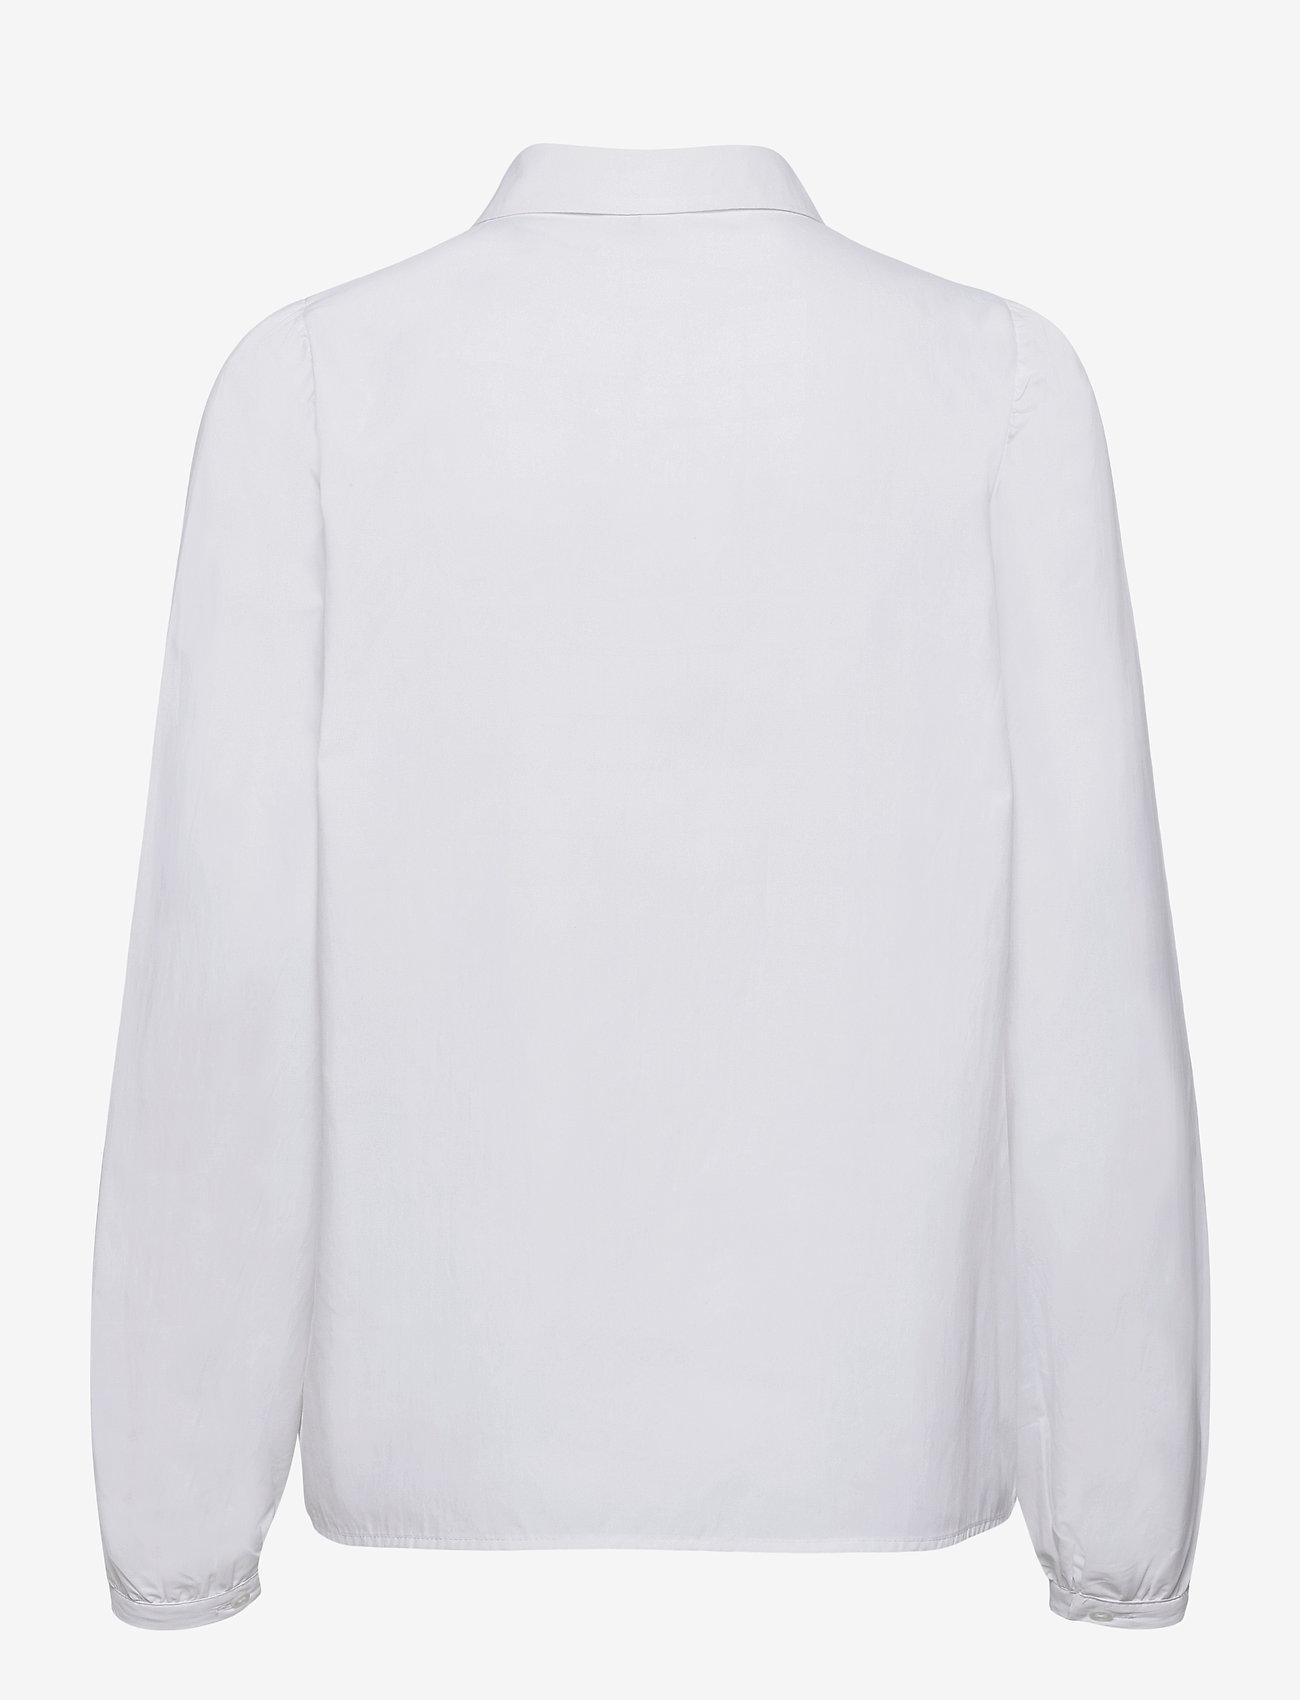 Soyaconcept - SC-NETTI - long-sleeved shirts - white - 1